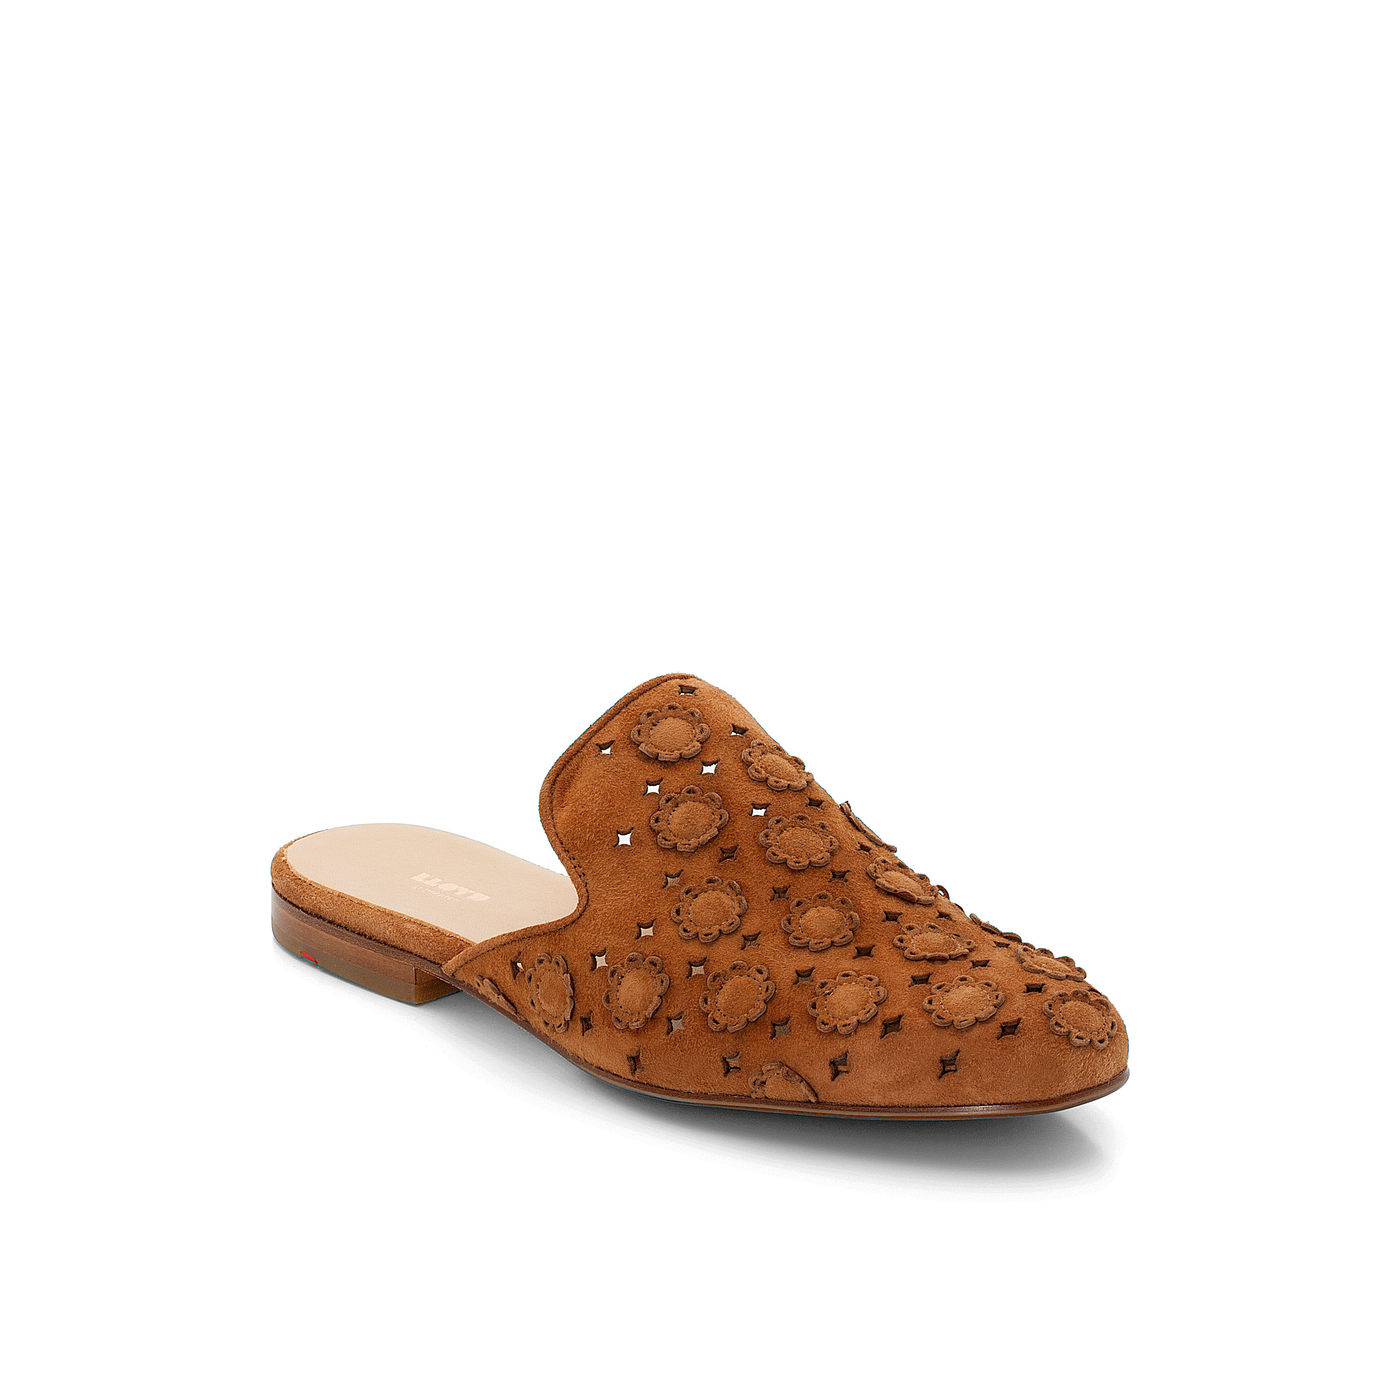 Sandalen   Schuhe > Sandalen & Zehentrenner > Sandalen   Lloyd